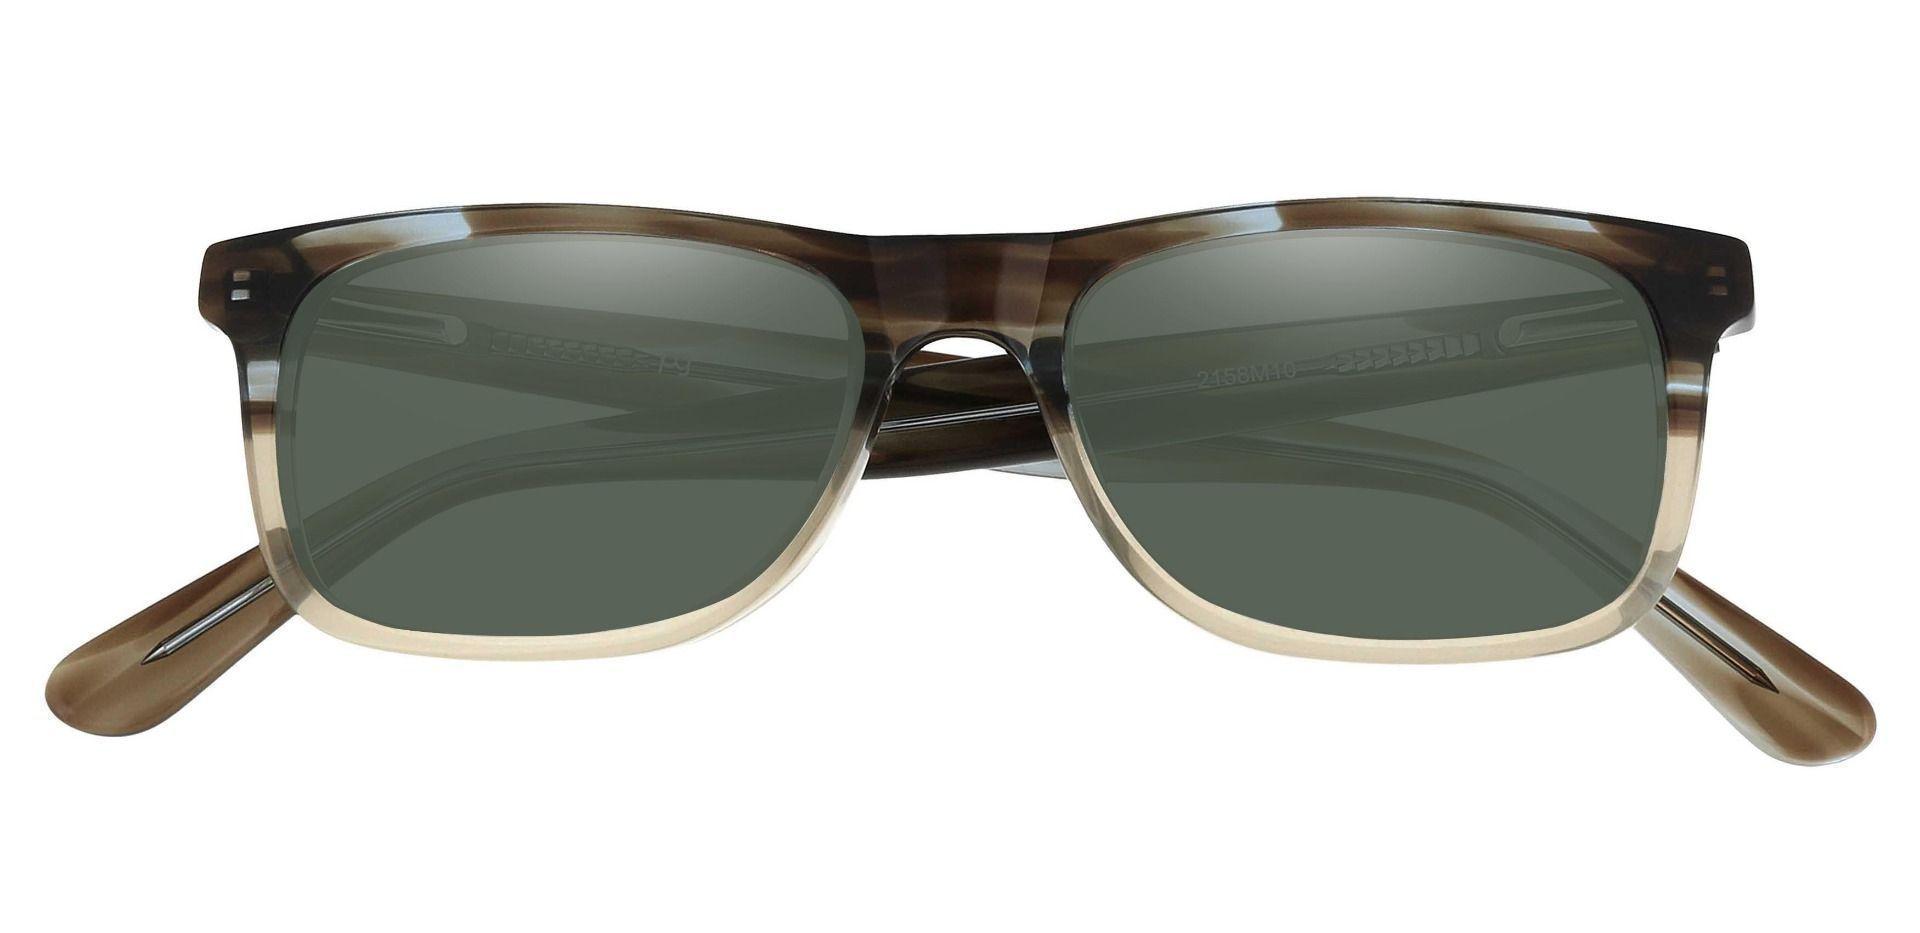 Denali Rectangle Prescription Sunglasses - Multi Color Frame With Green Lenses